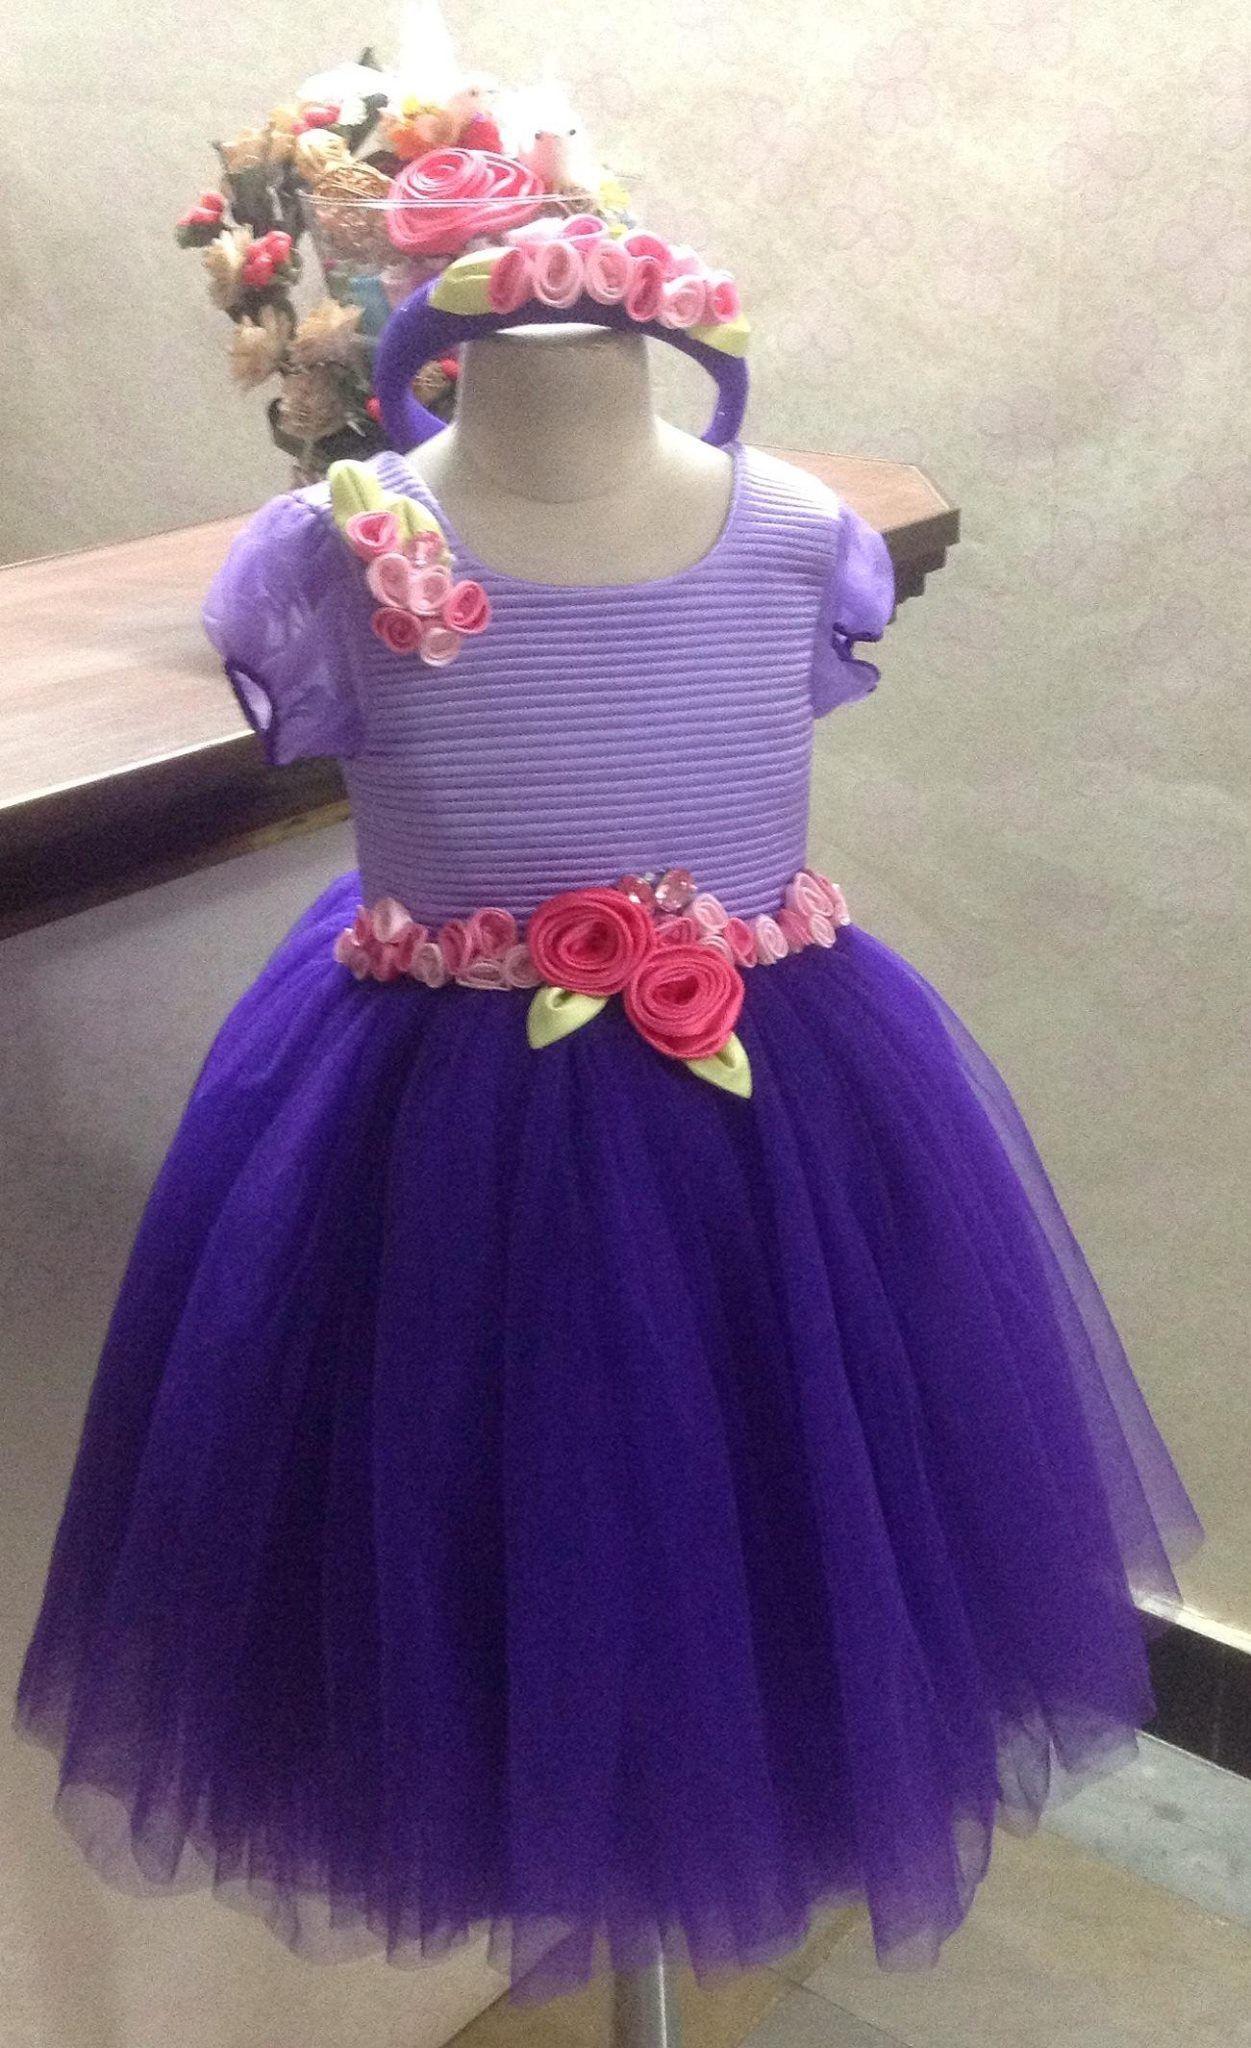 Pin de Divya Gaddipati en Frocks | Pinterest | Vestidos de niñas ...